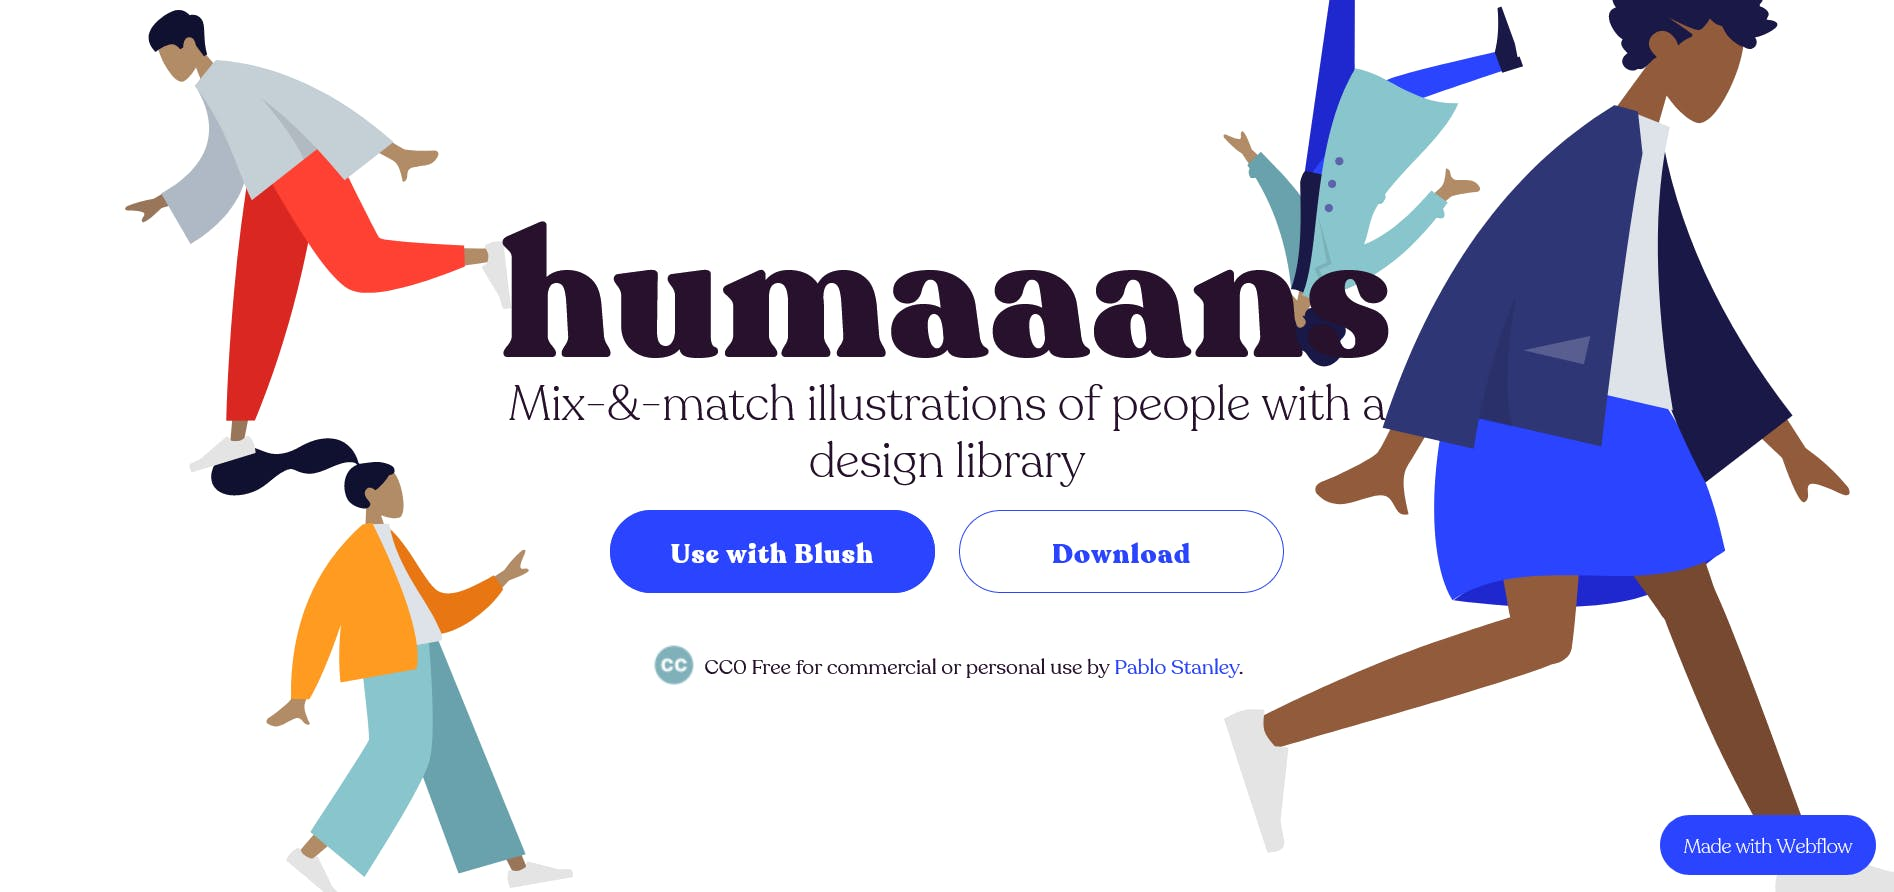 Screenshot 2021-04-29 at 20-50-37 Humaaans Mix- -Match illustration library.png